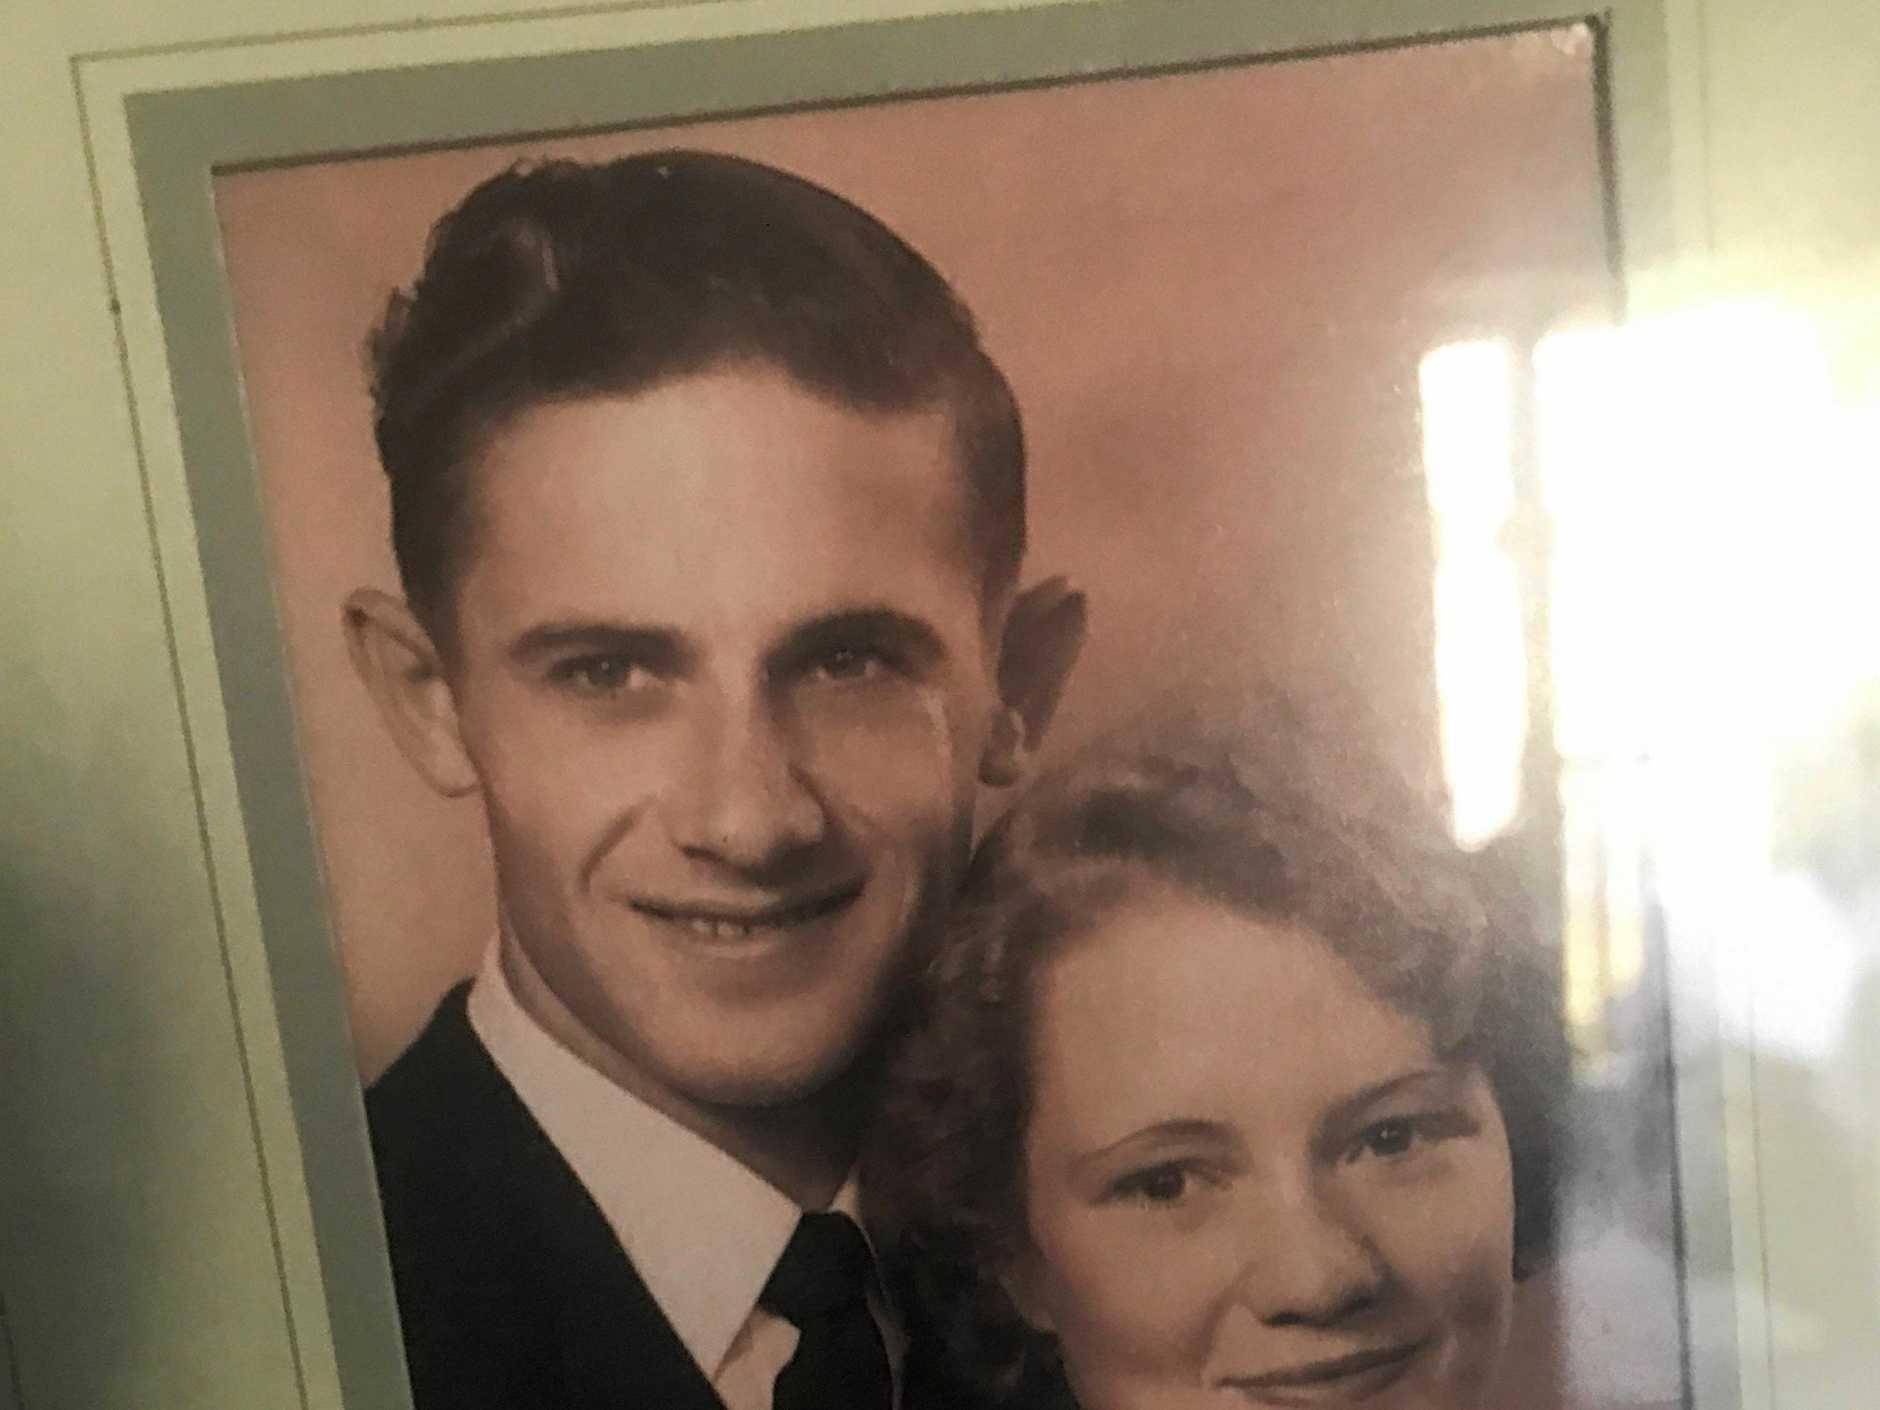 Settimio 'Sam' Tortora and Maisie Newton, when they were first engaged.